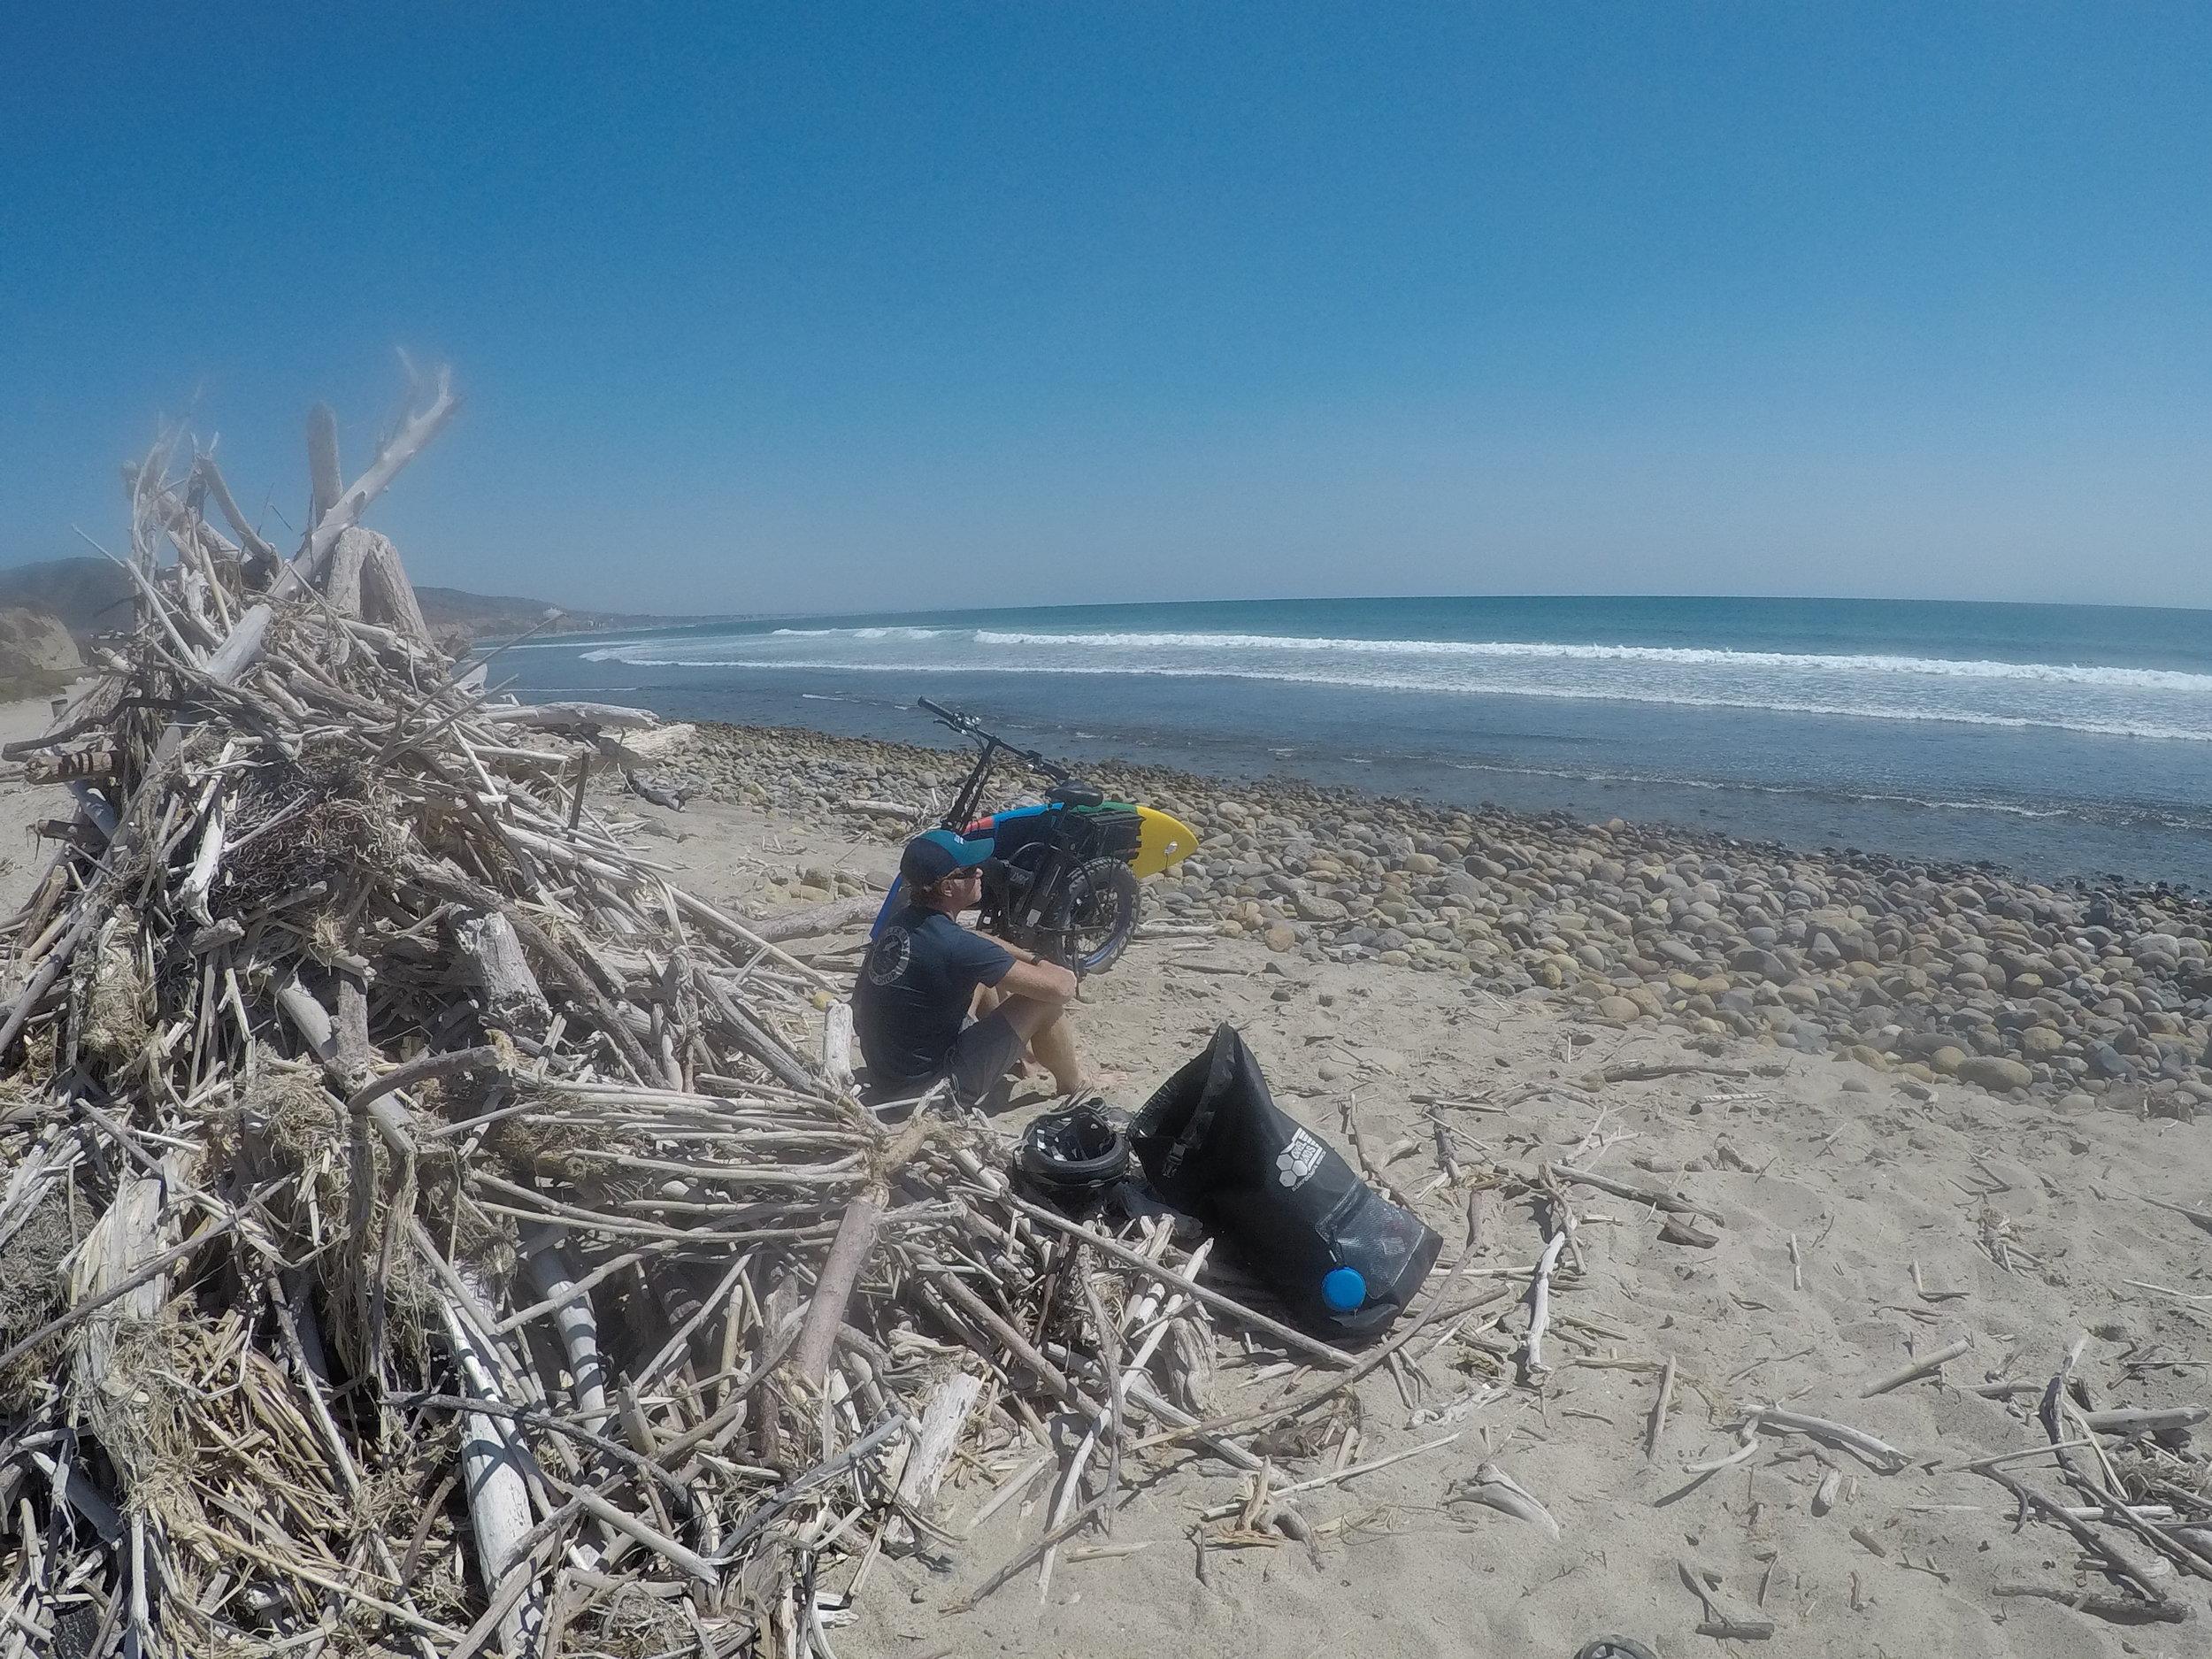 Eric Mike Jones Surf Electric Bike water beach surf boardsGOPR0934 (1).JPG